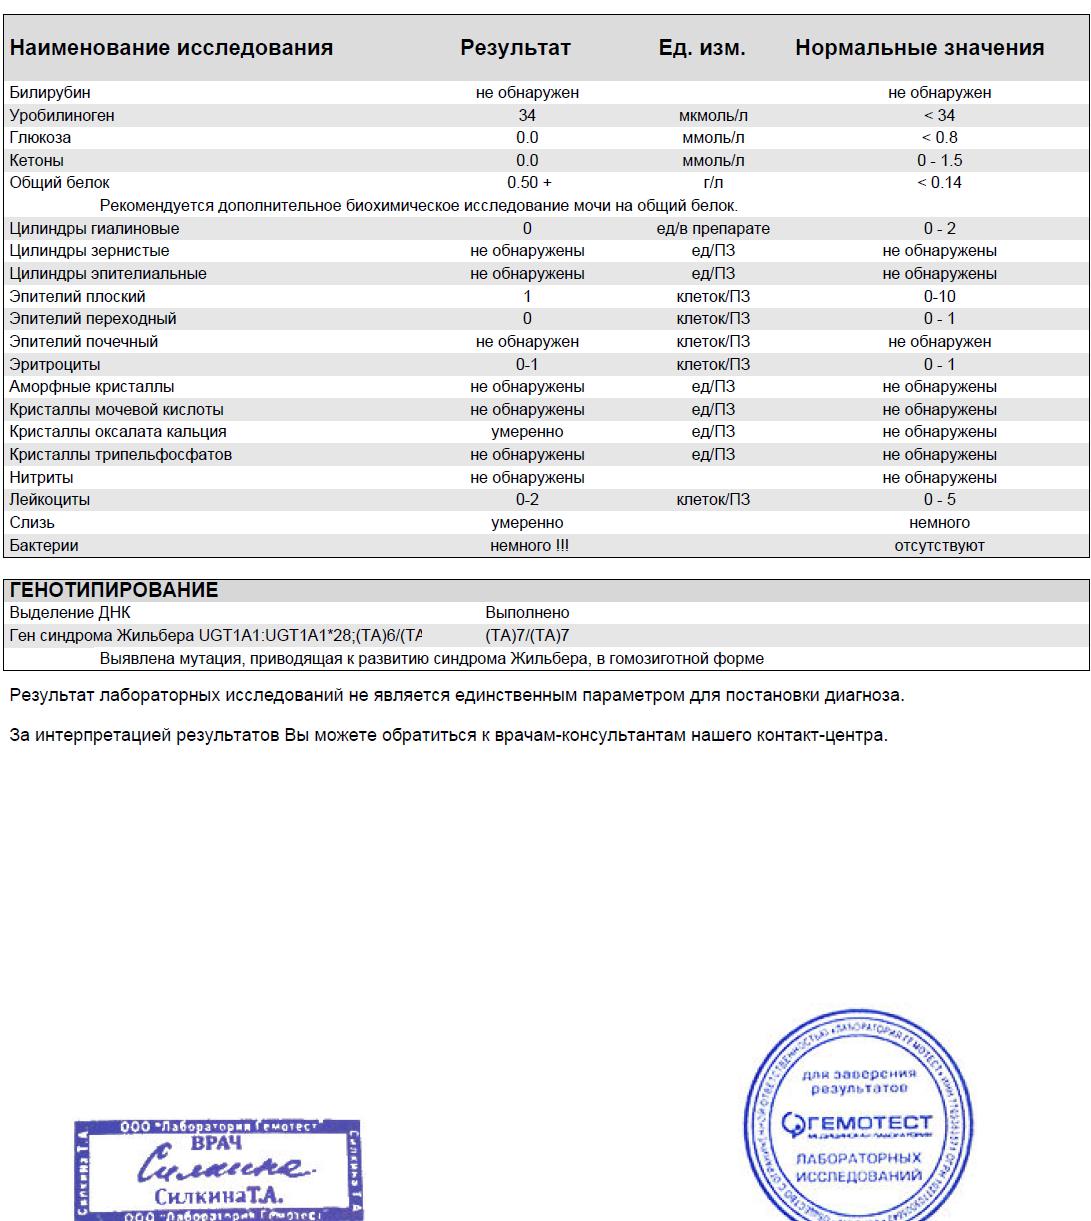 анализ крови на синдром жильбера